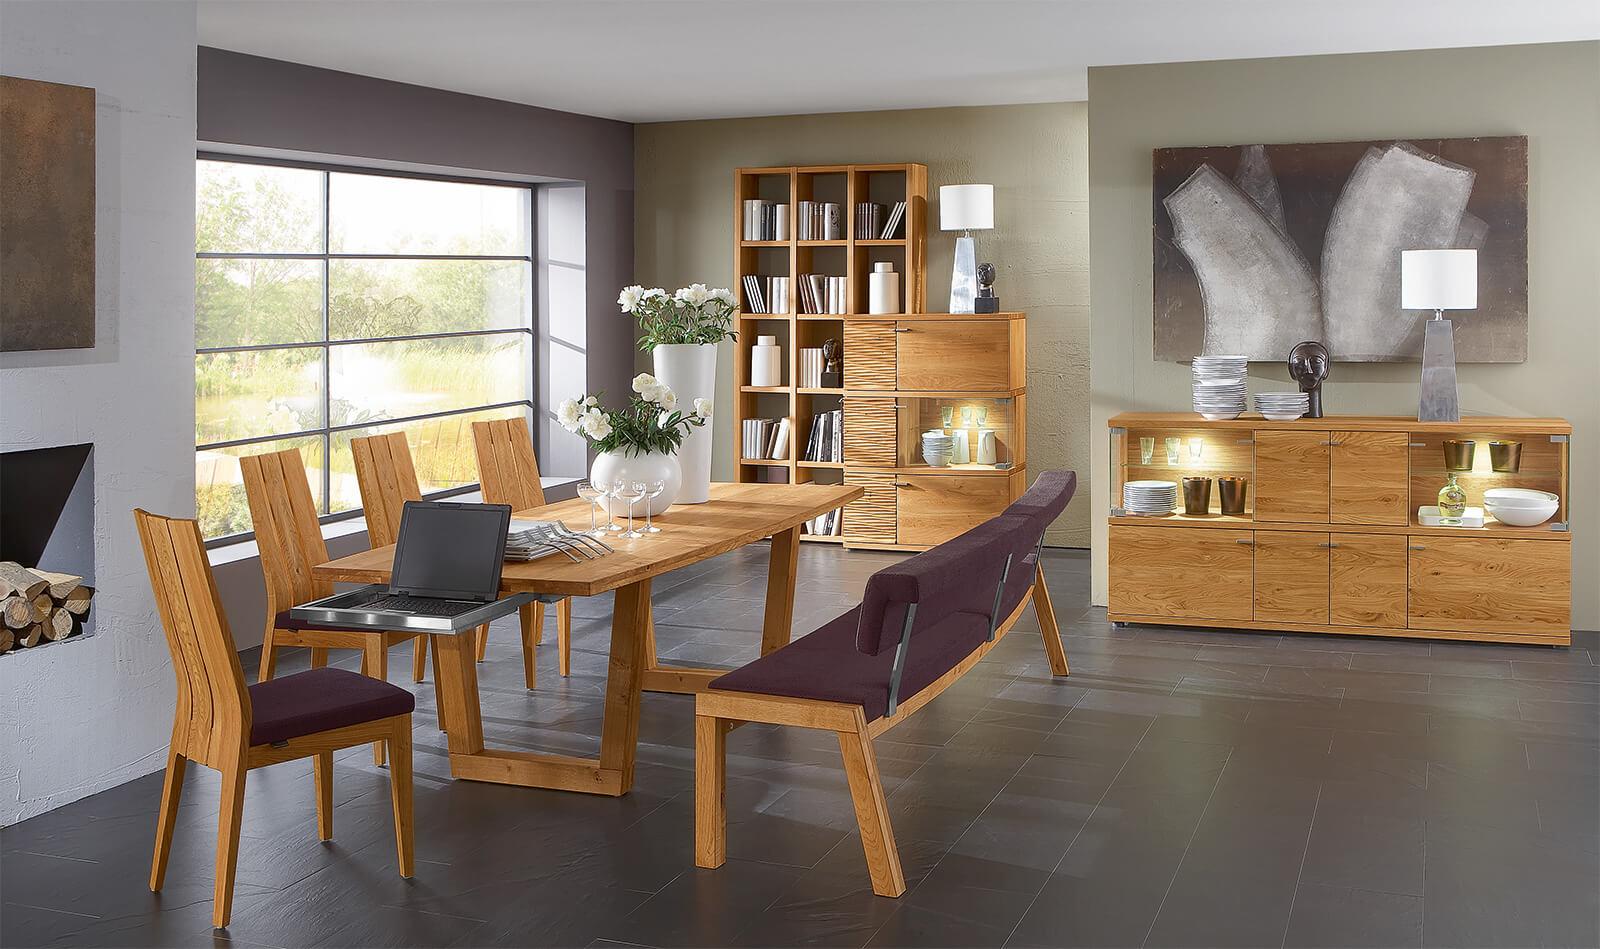 venjakob esszimmer esszimmer mit kcheweisse sthle modern esszimmer berlin esszimmer weiss lack. Black Bedroom Furniture Sets. Home Design Ideas